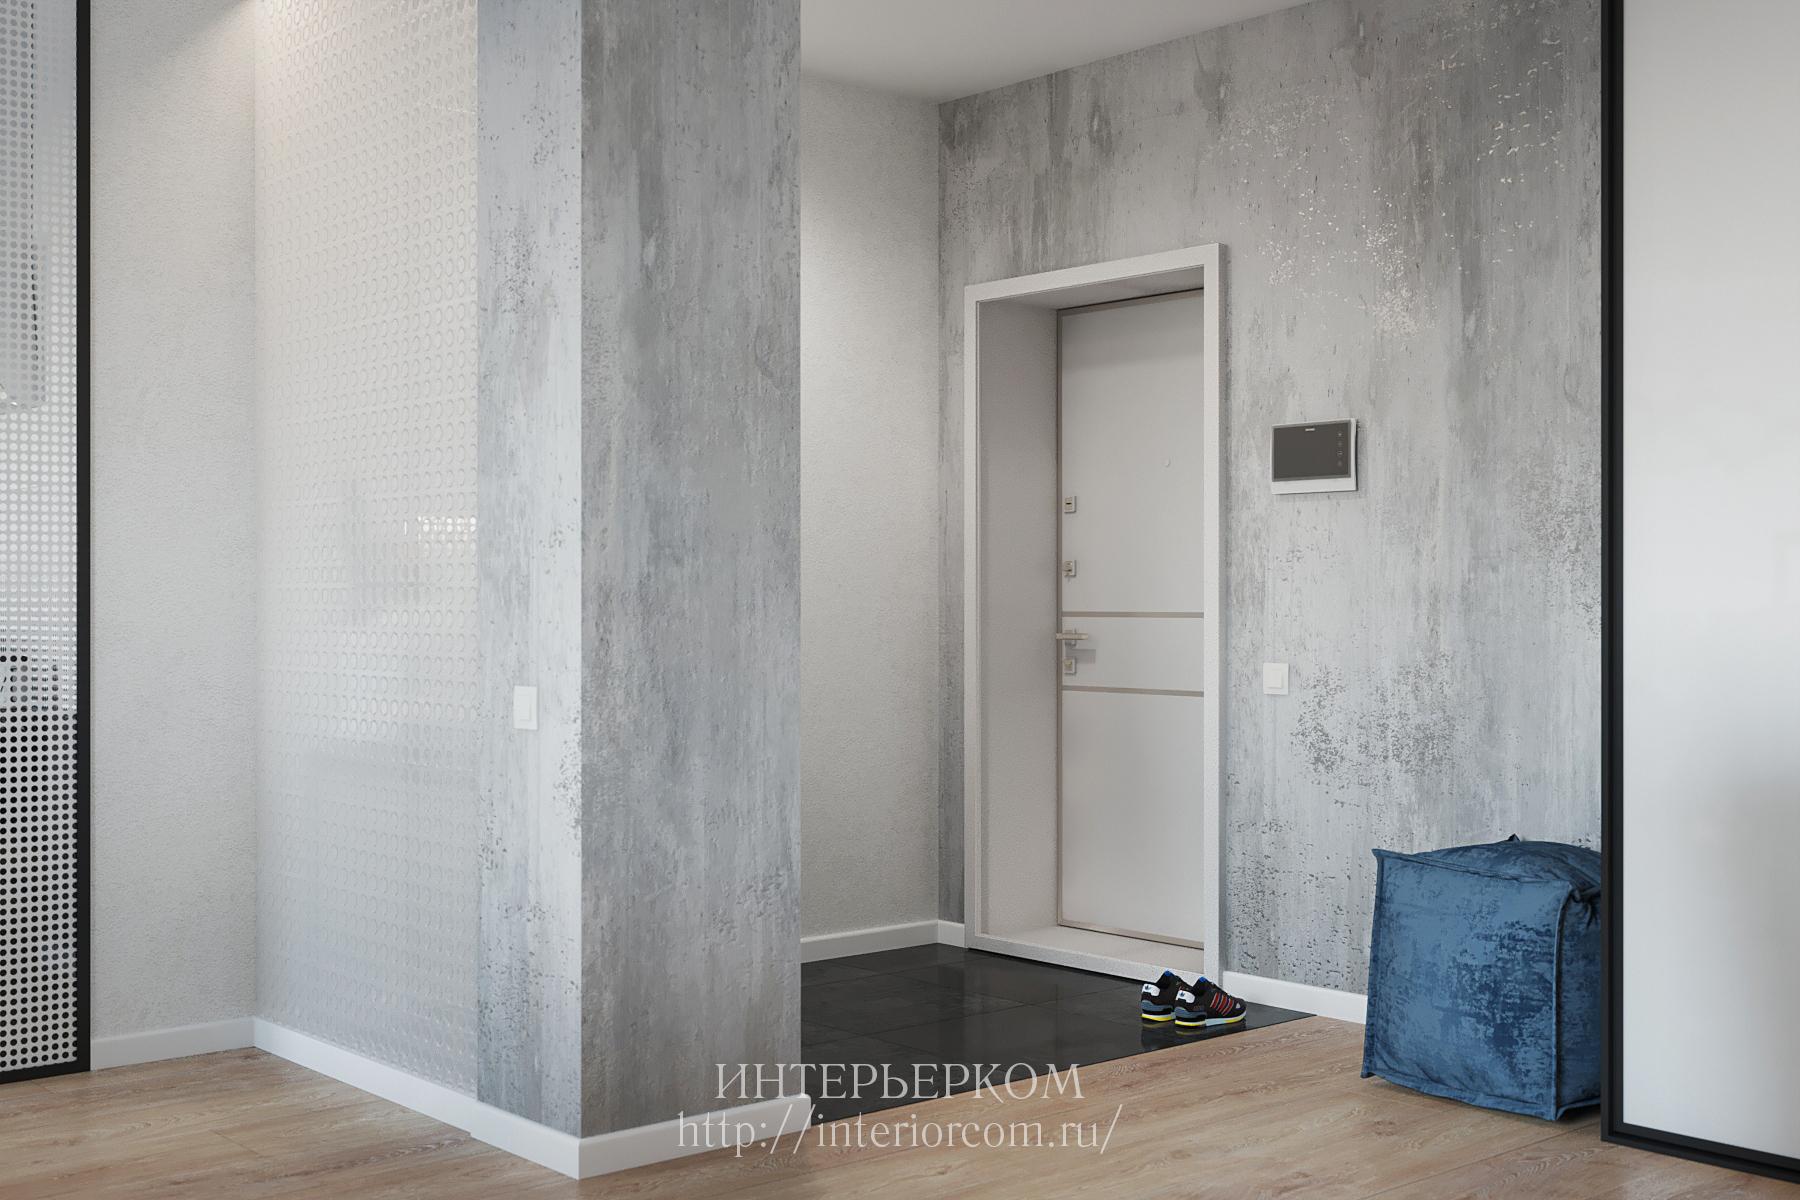 стены под бетон в интерьерье